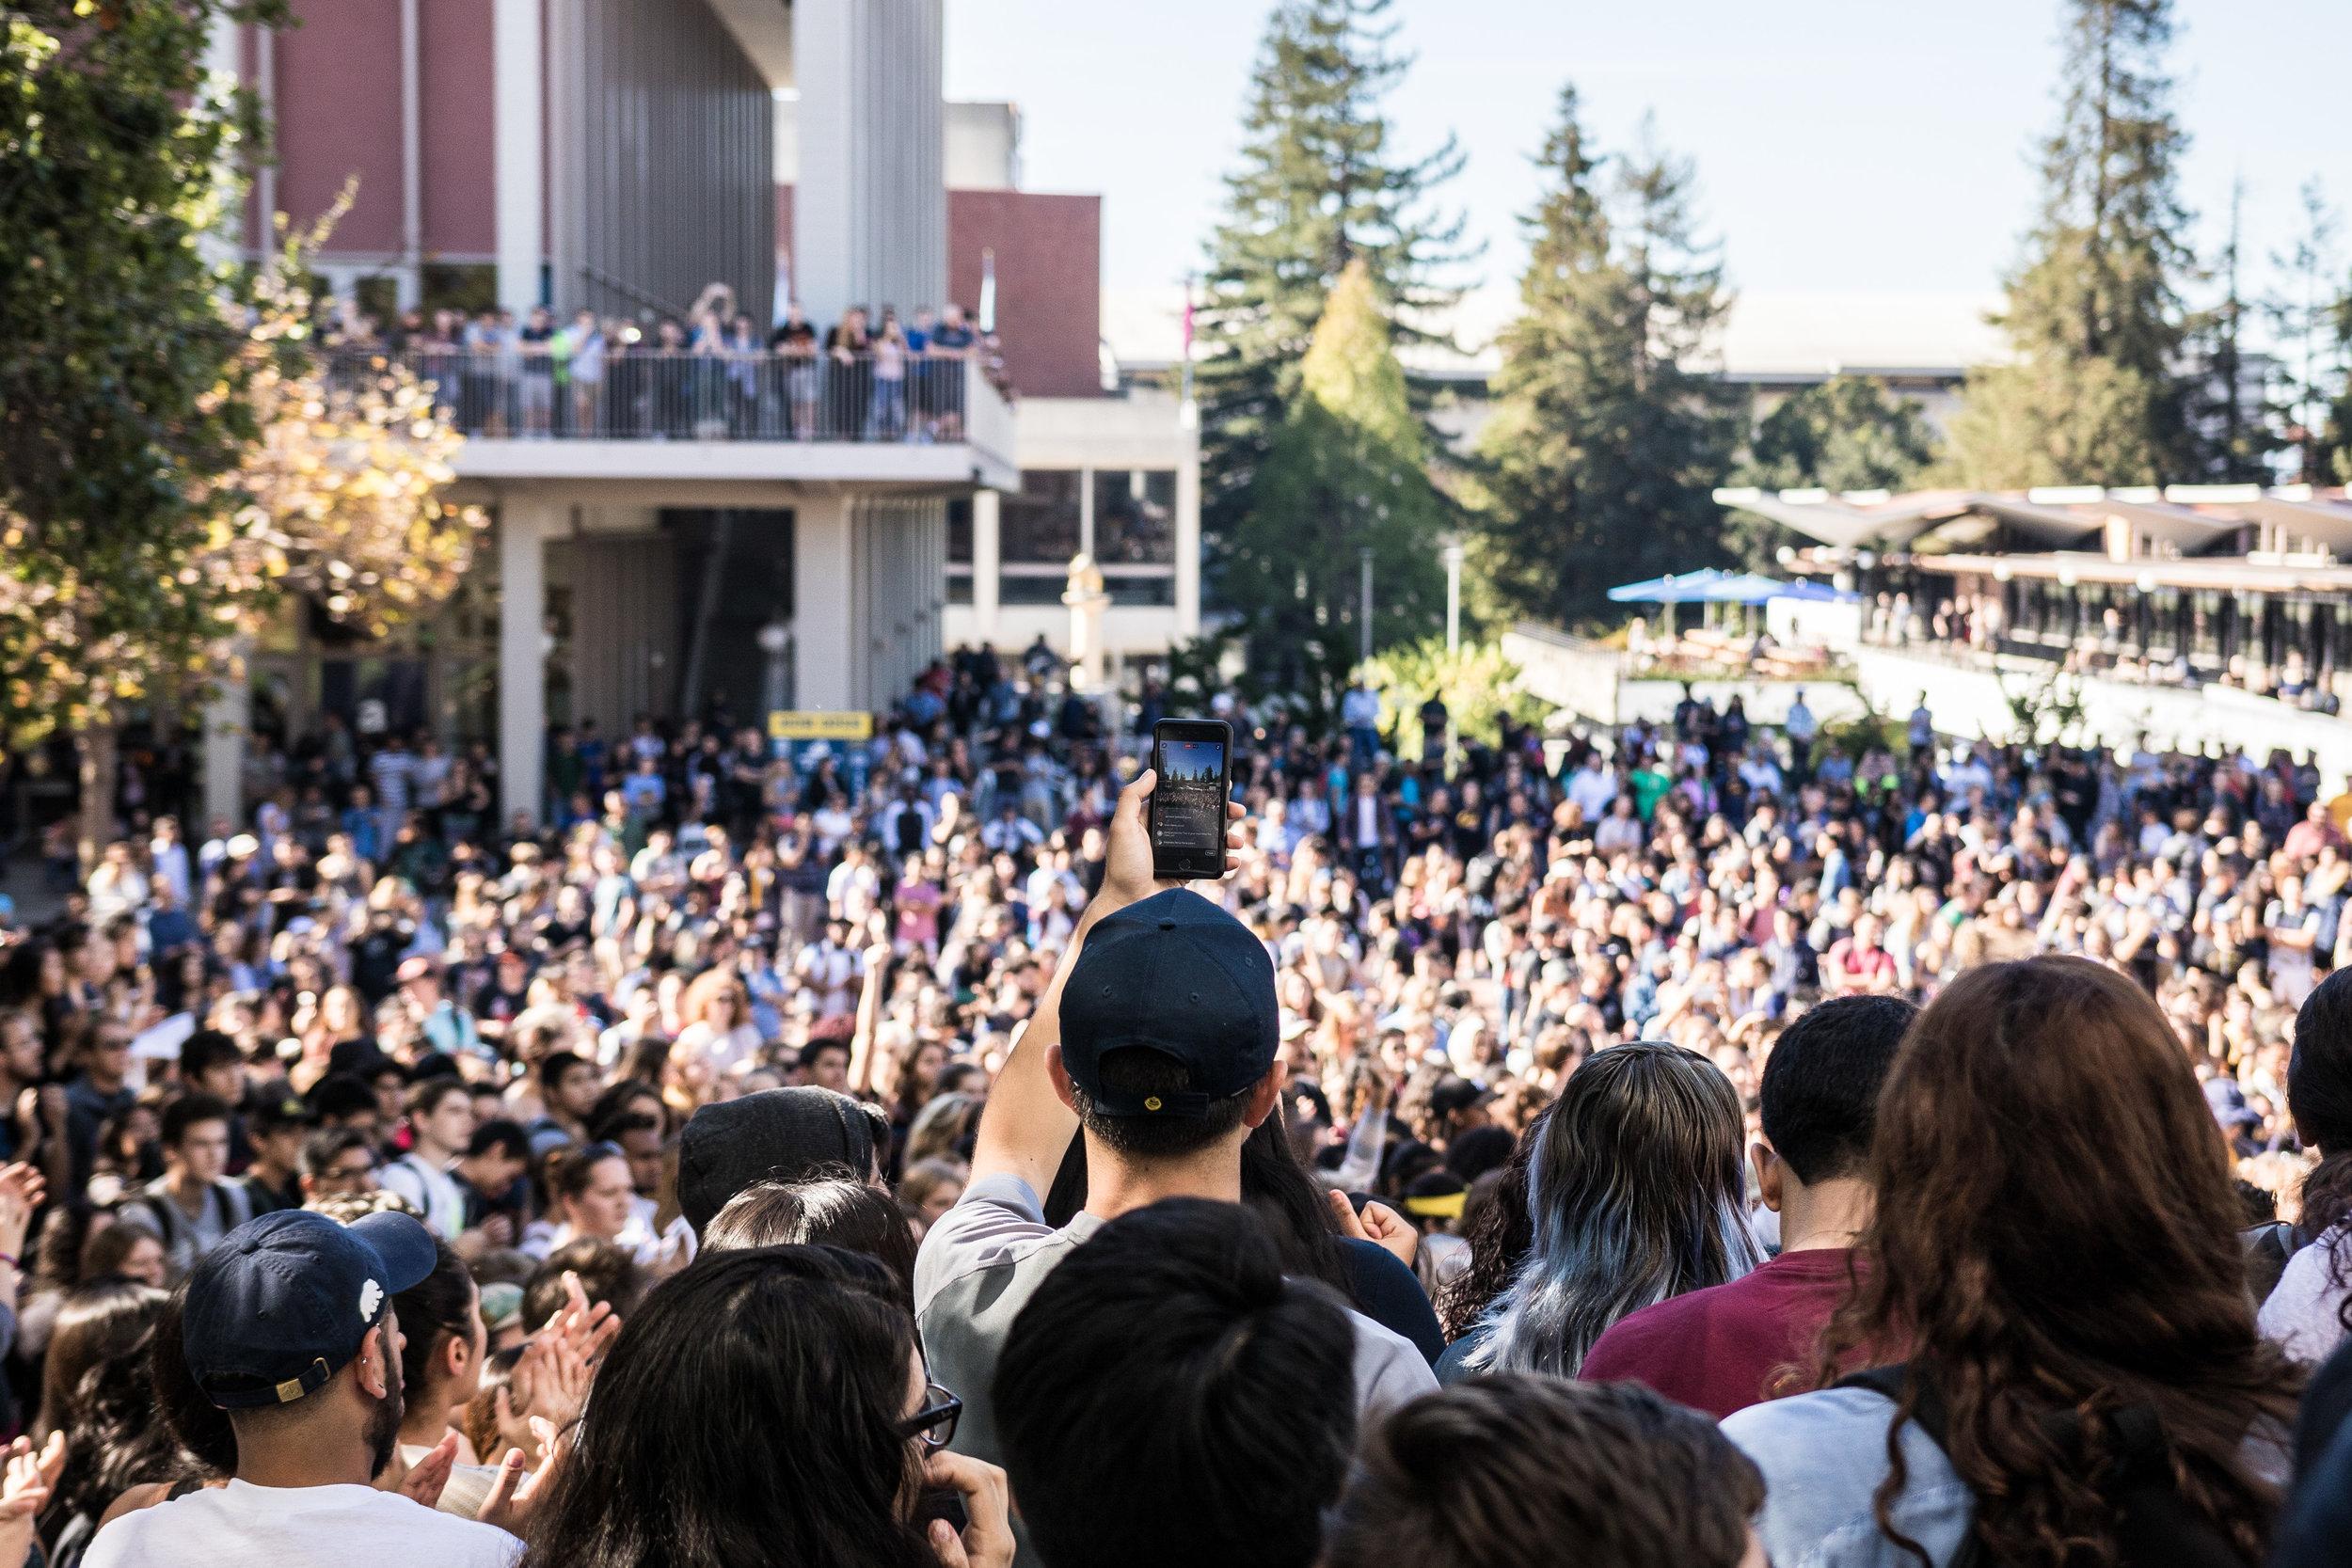 Berkeley-Nov9Rally2-PhoneCrowd-FullRes.jpg